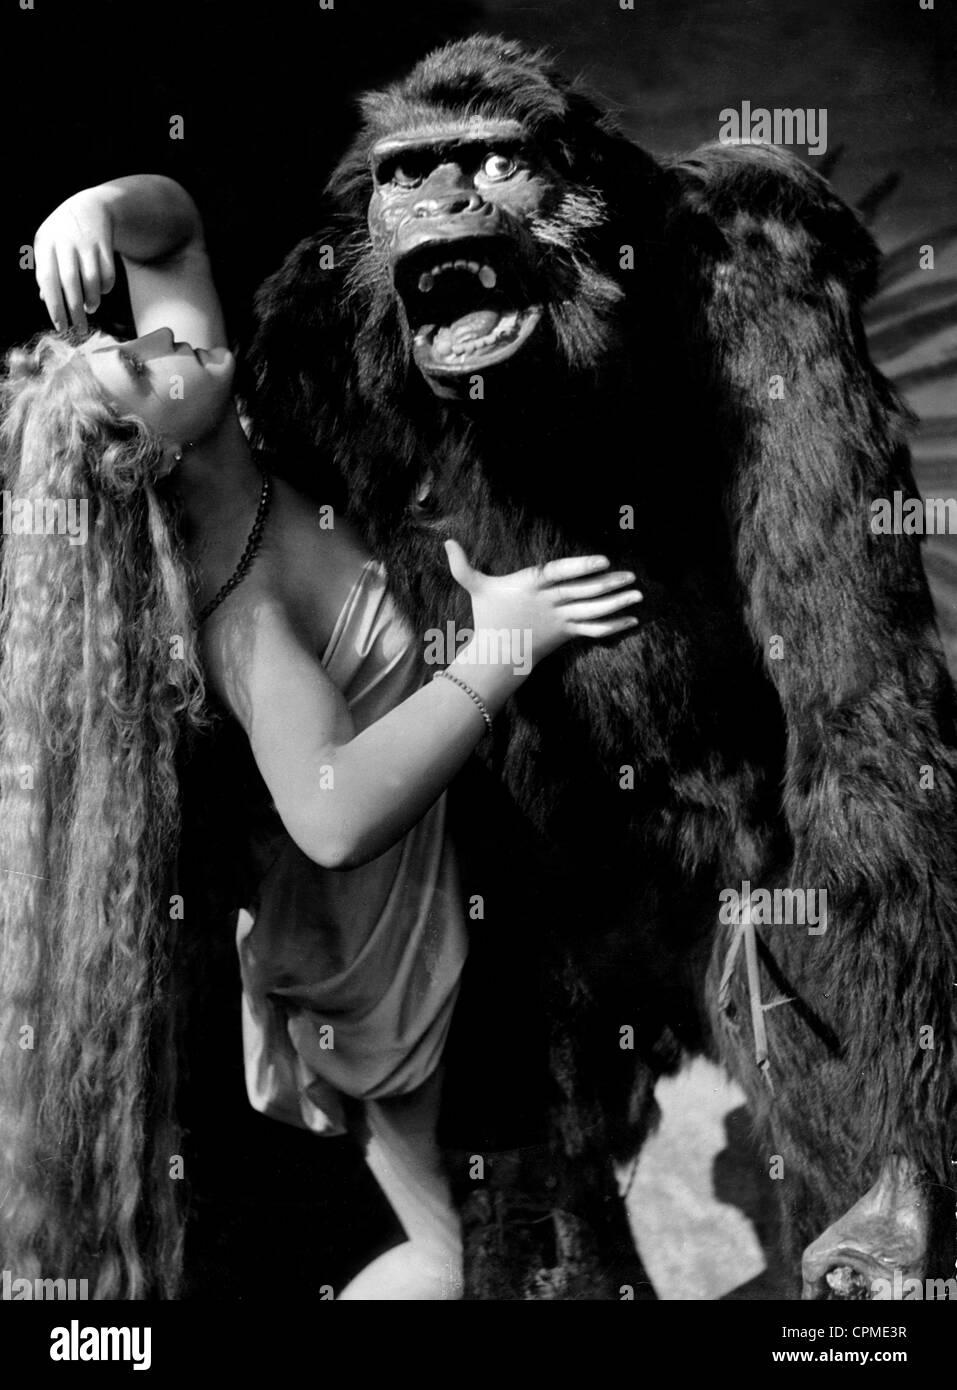 Fay Wray in King Kong 1933 Stock Photo Royalty Free Image